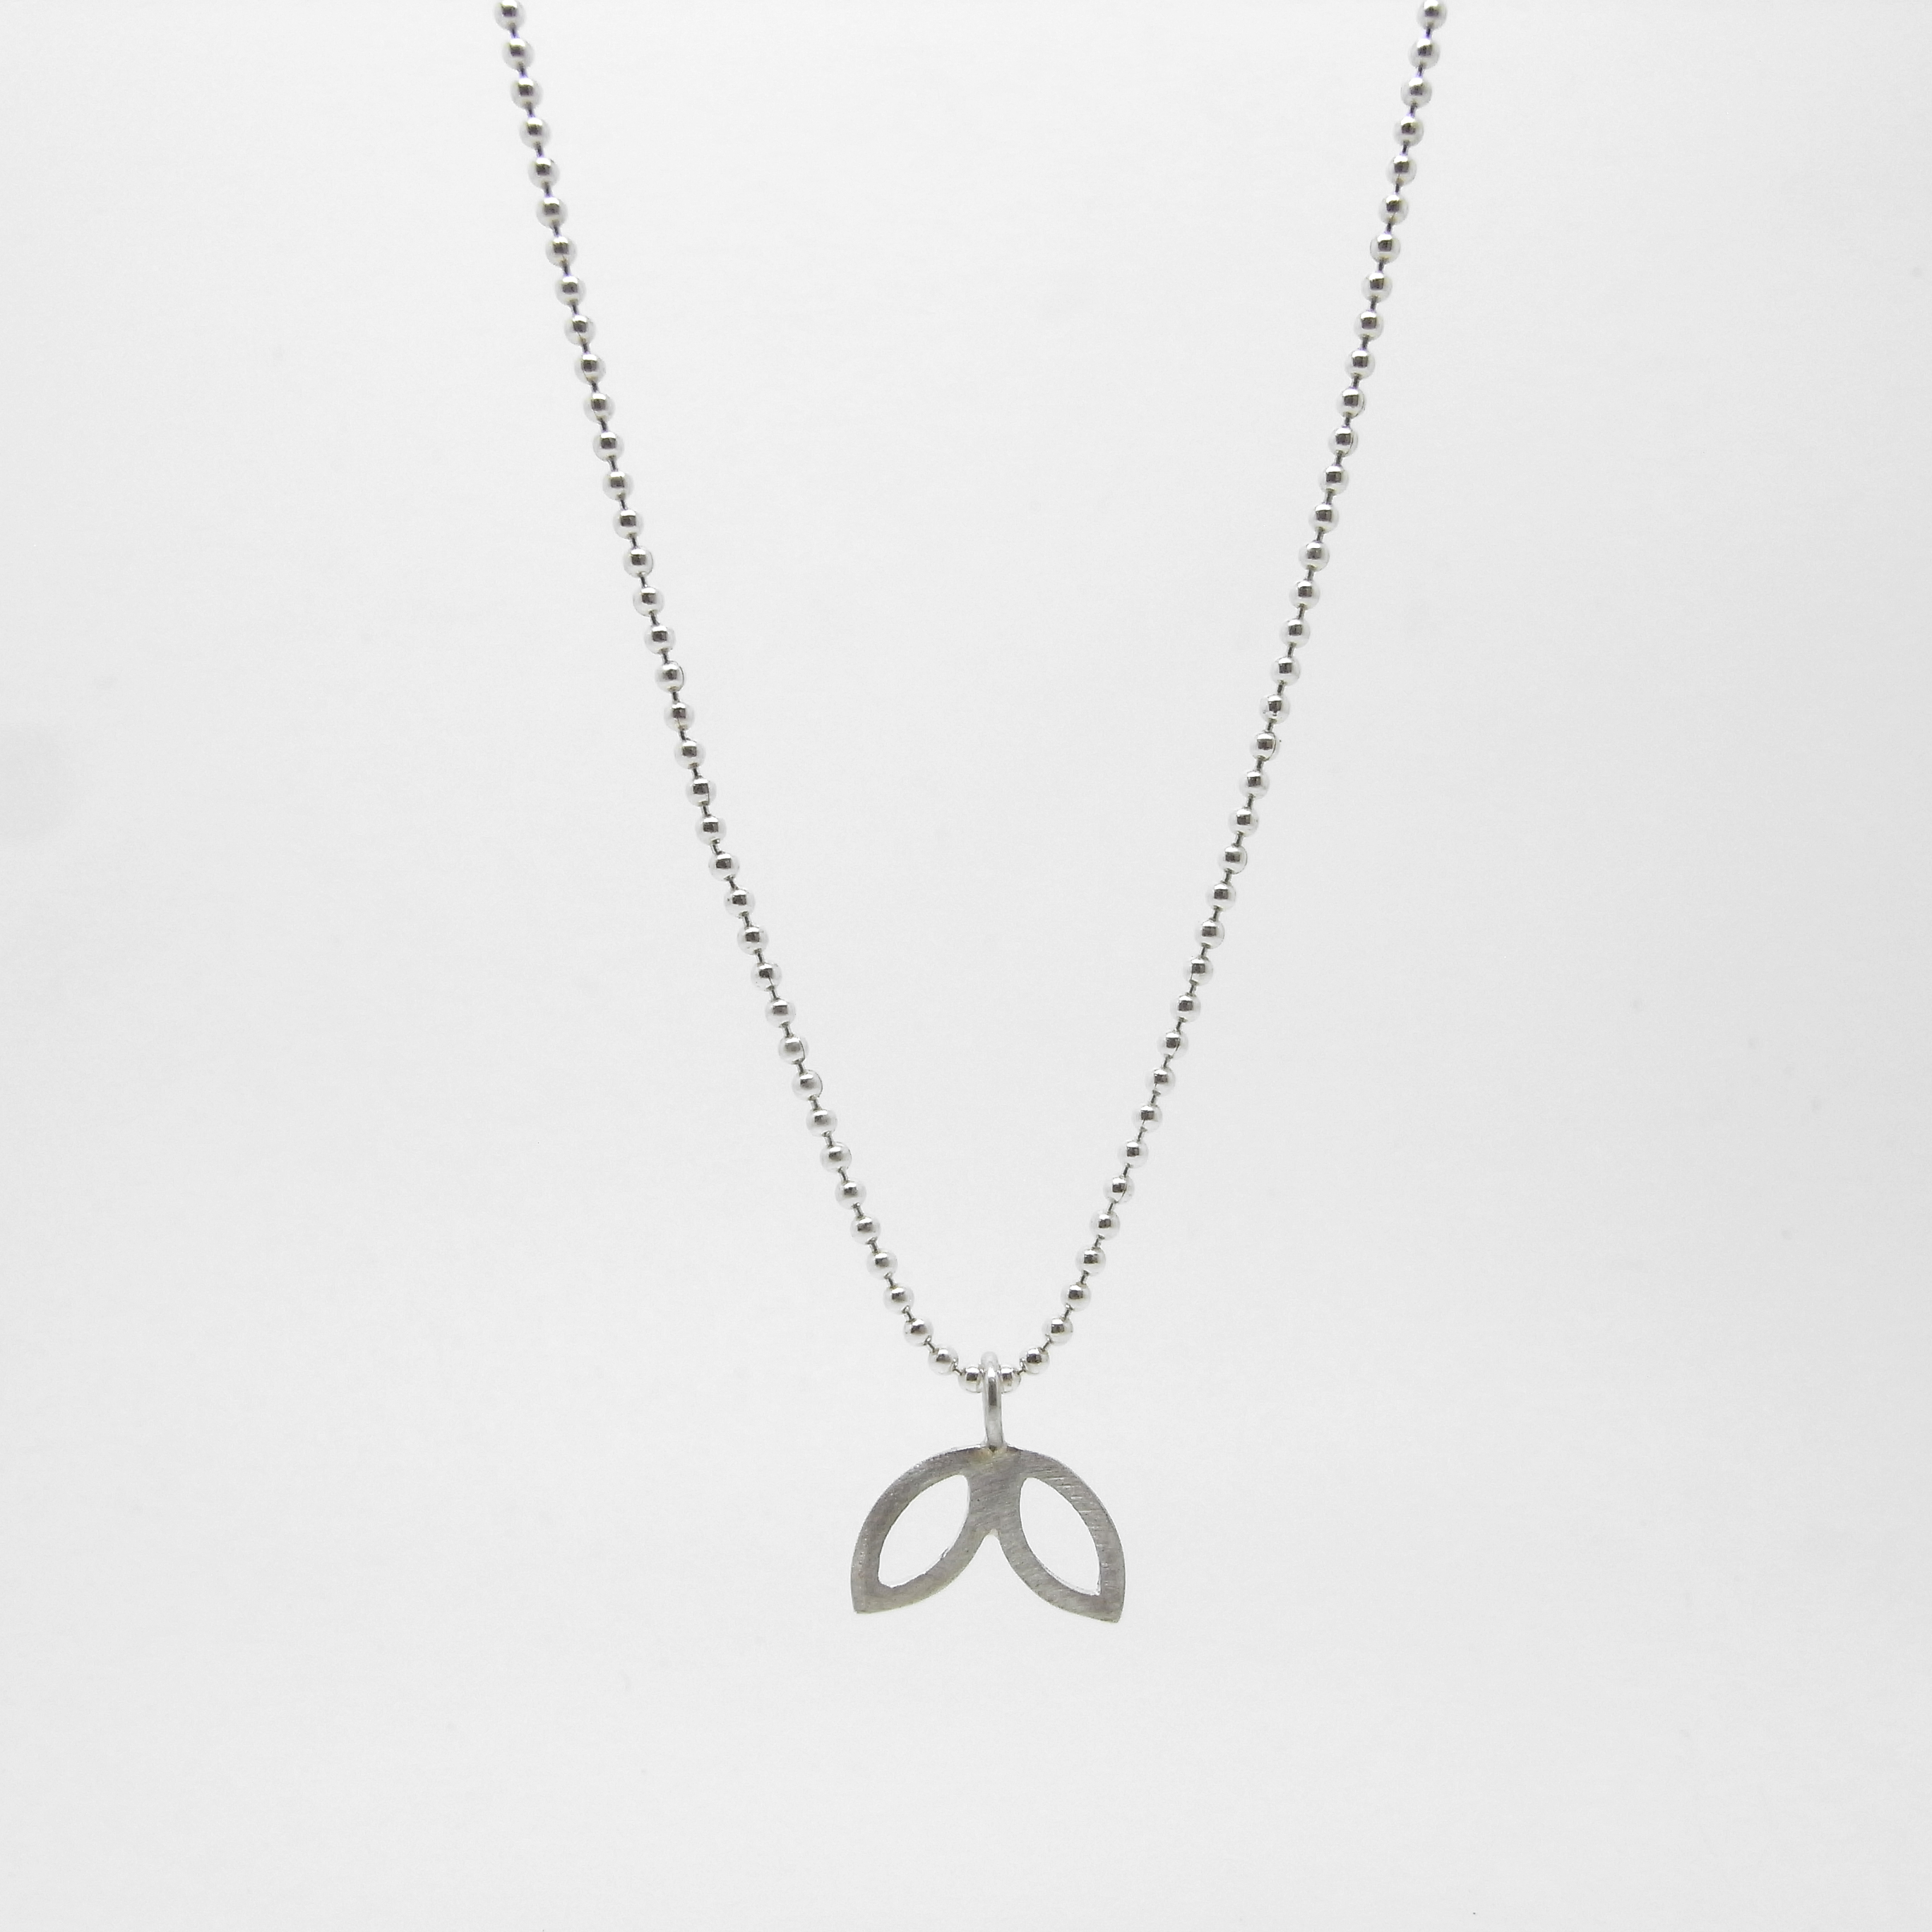 SALE - Silver Petal Necklace